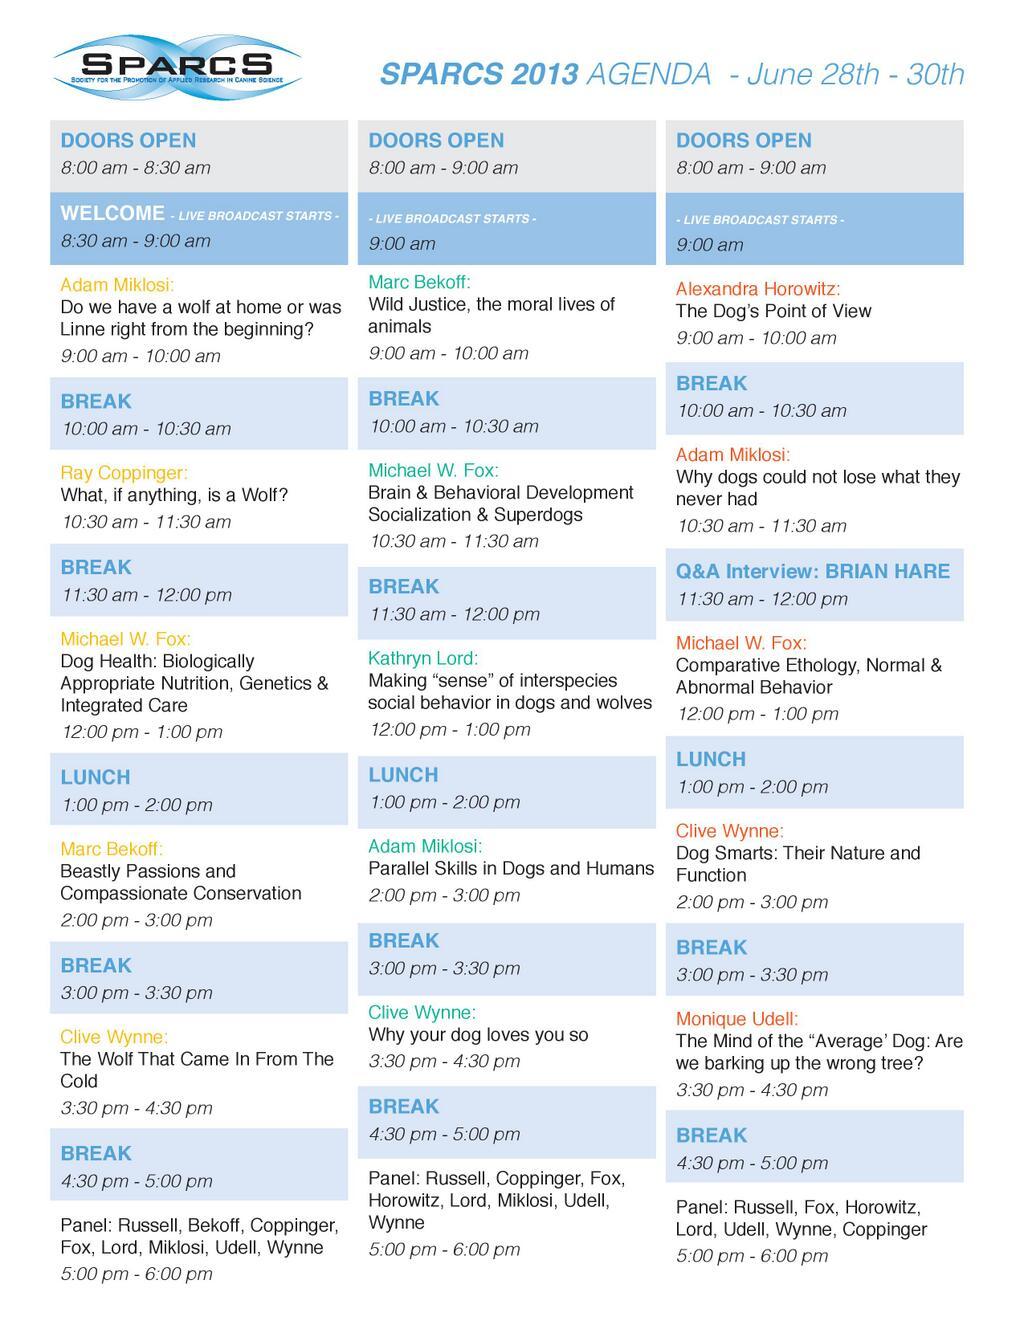 Calendario conferenze #SPARCS2013